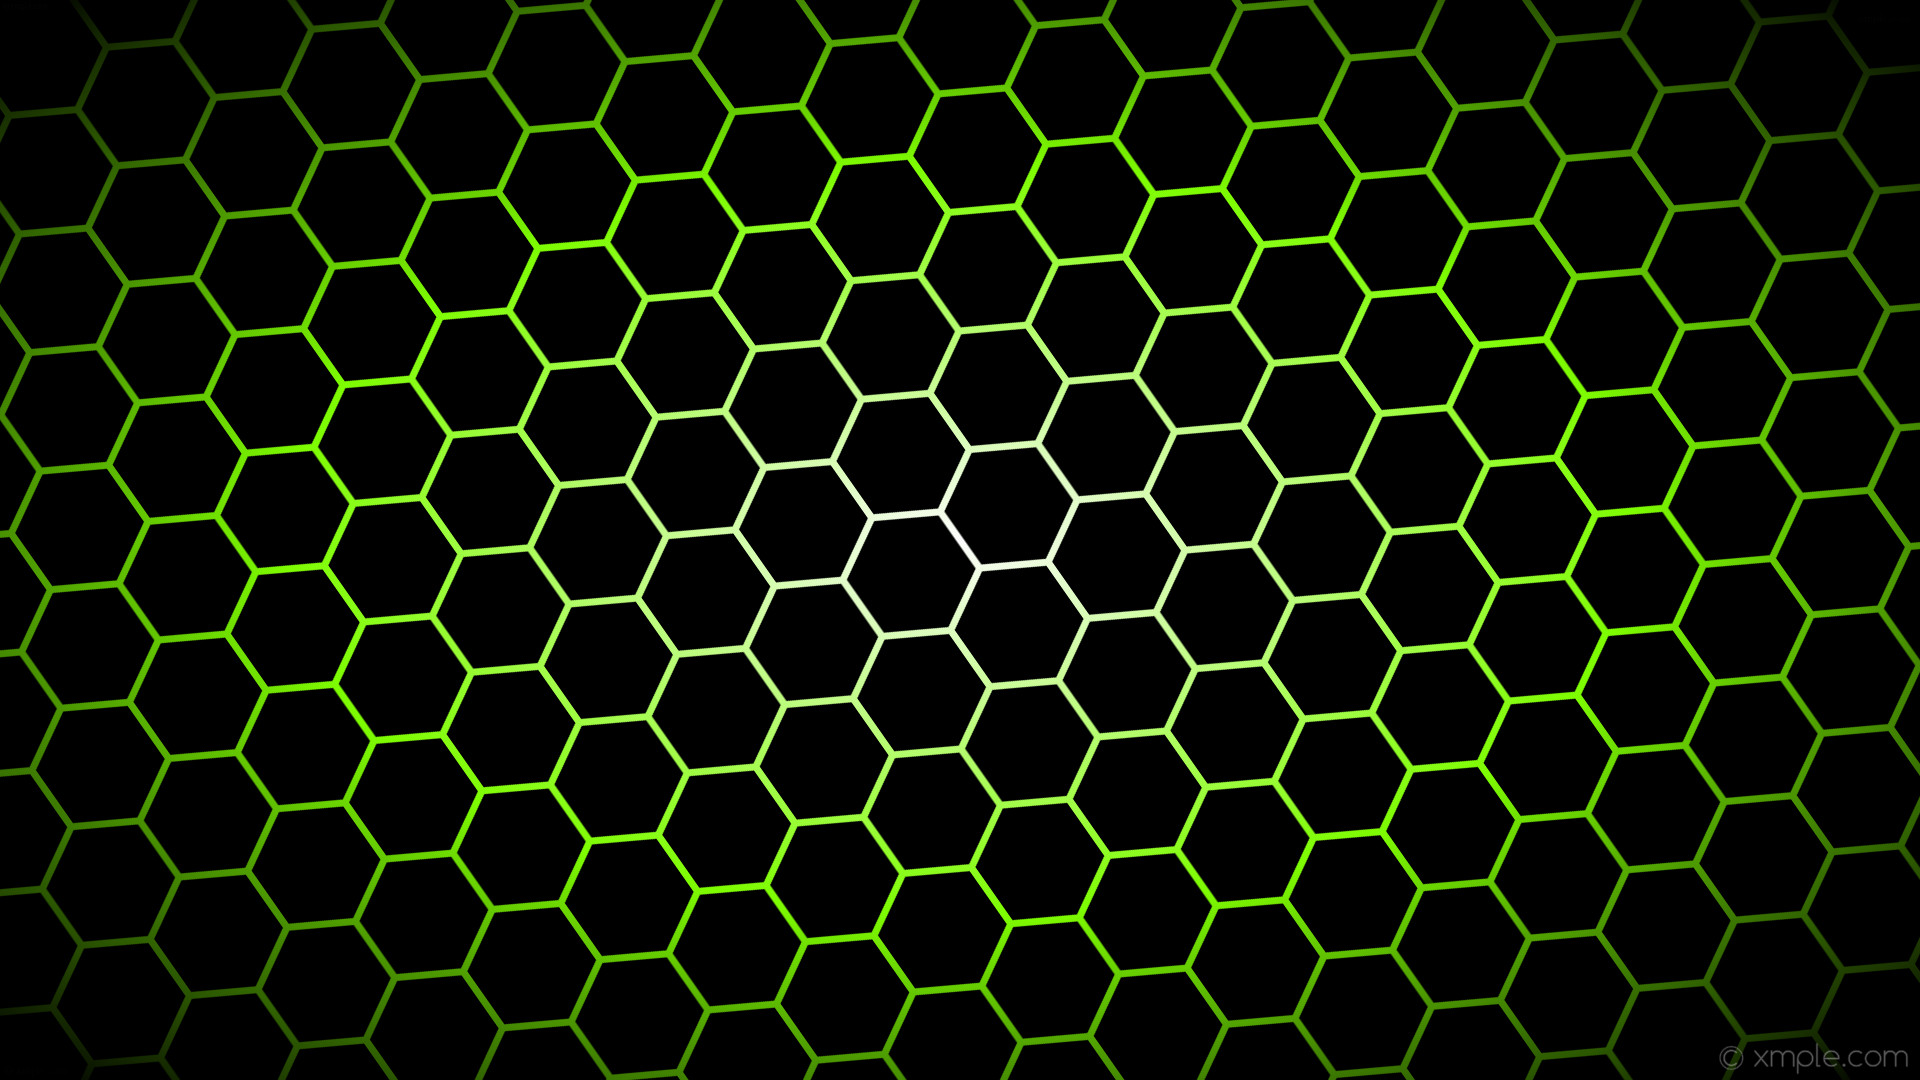 wallpaper black hexagon glow gradient white green chartreuse #000000  #ffffff #7fff00 diagonal 35